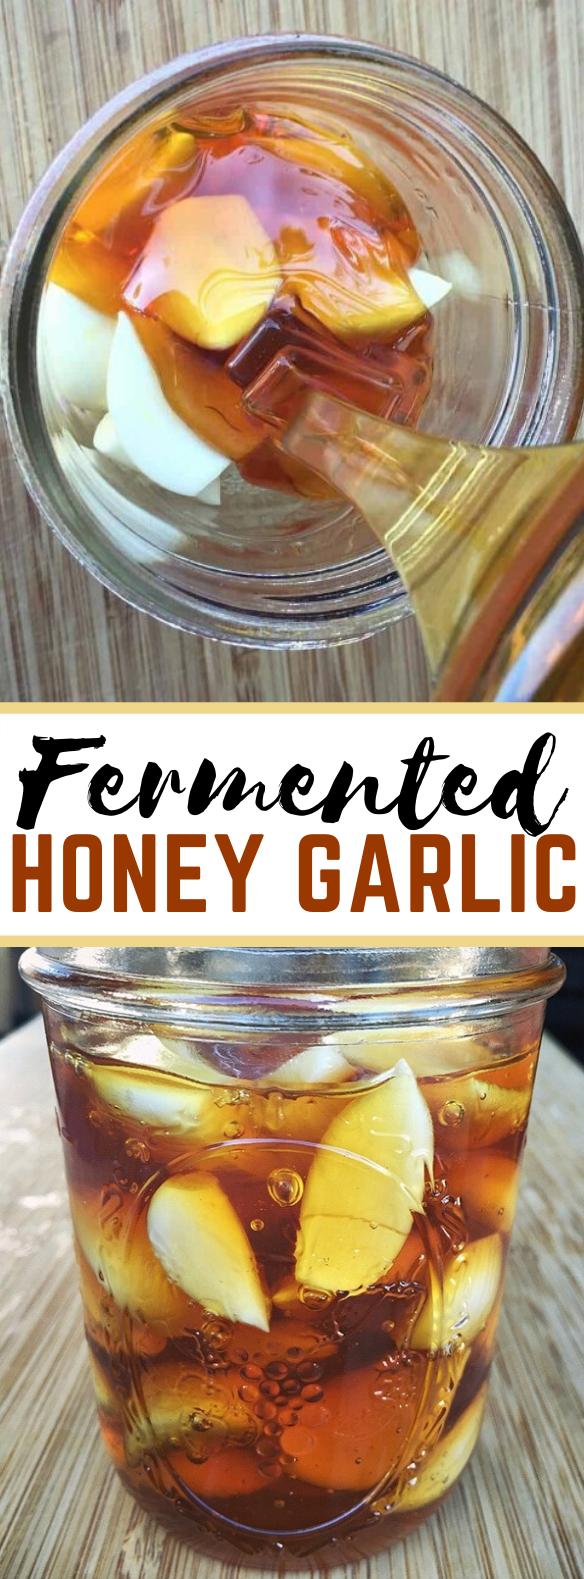 Fermented Honey Garlic Recipe #healthy #herbal